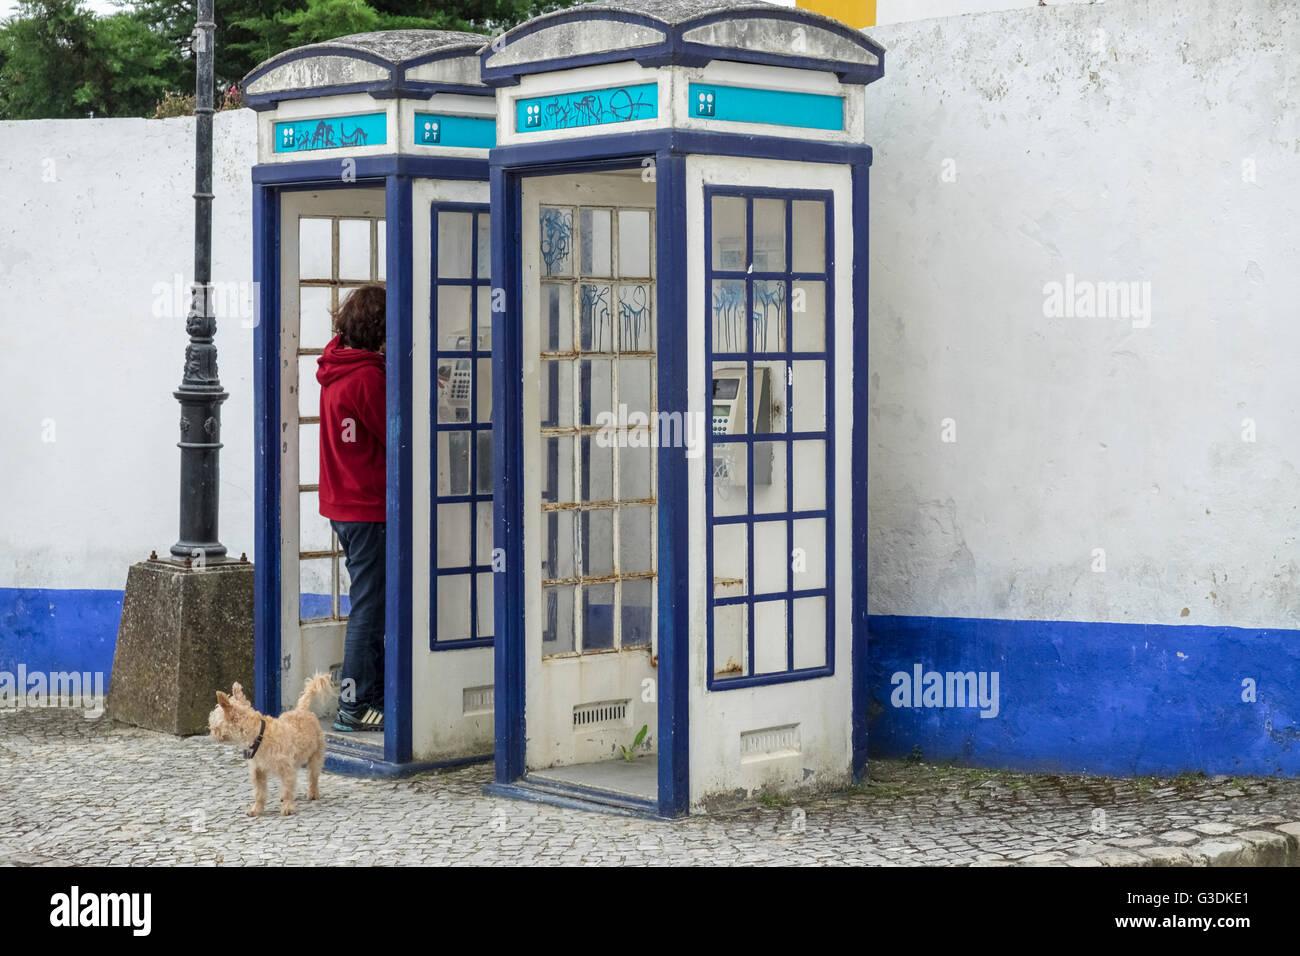 Woman using old style landline telephone box, Obidos, Estremadura, Portugal - Stock Image